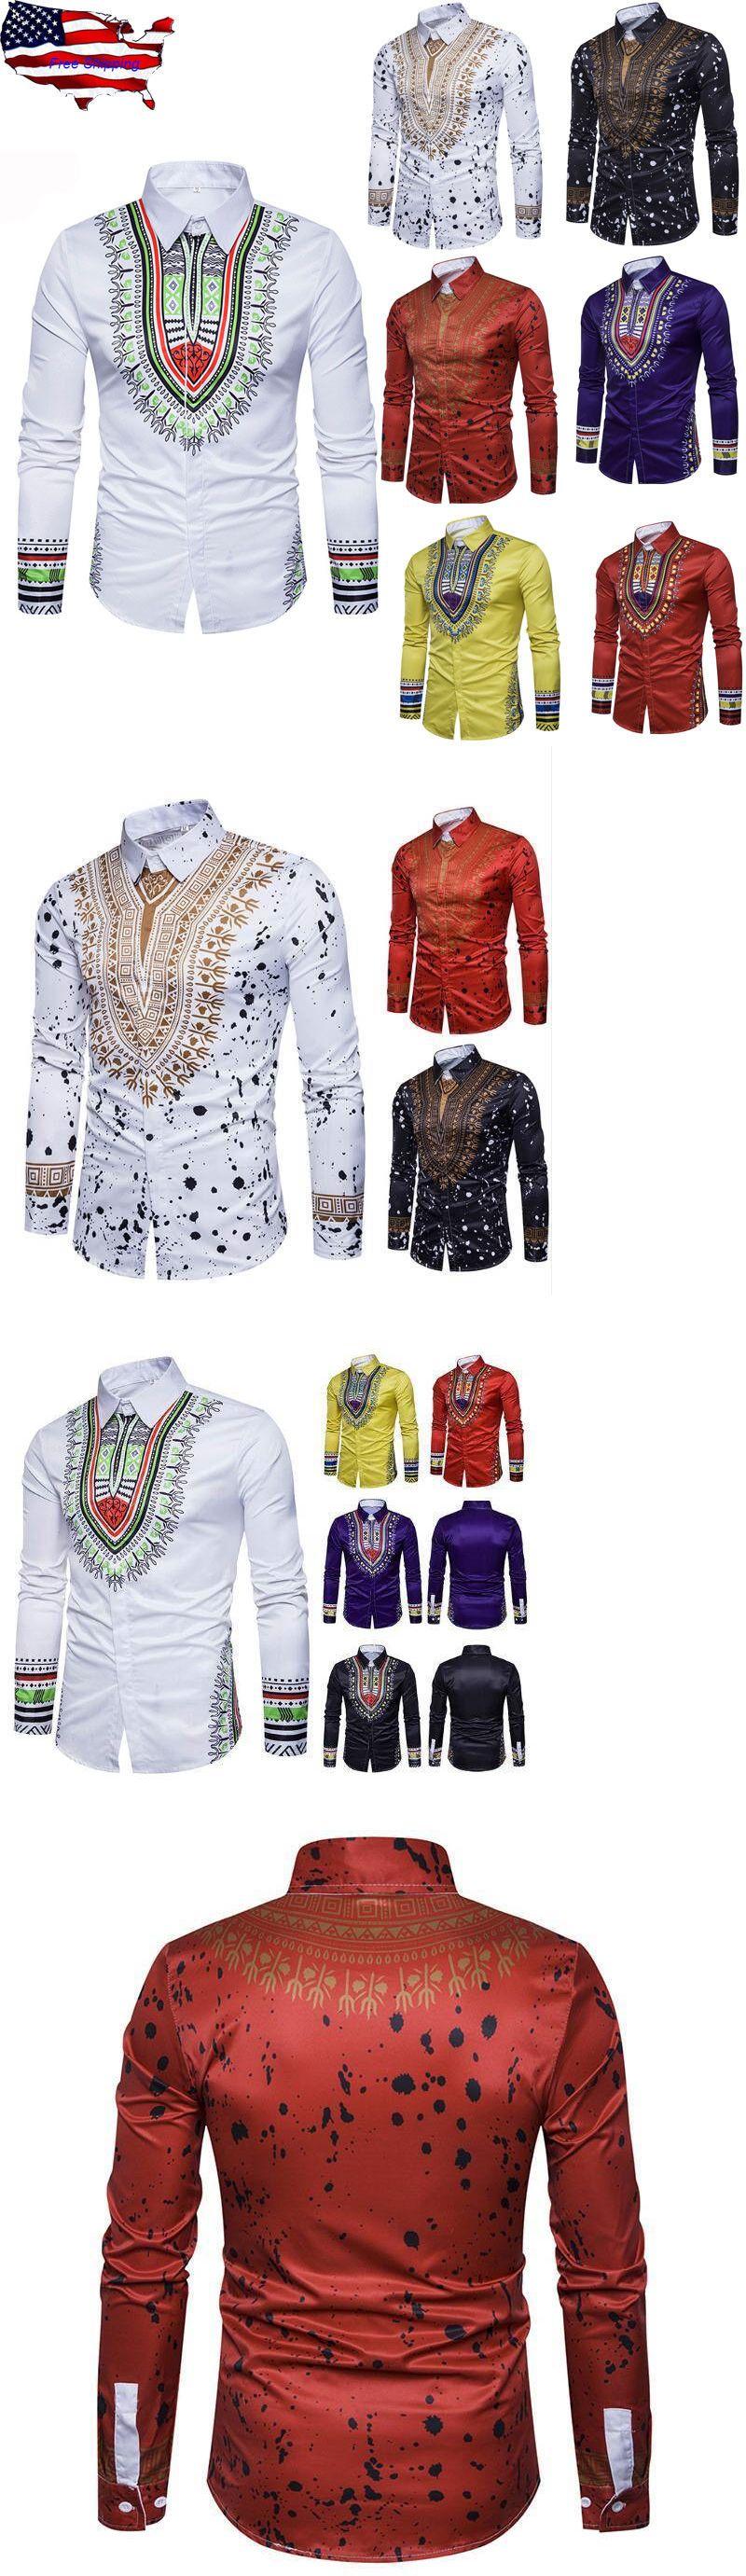 79e0dbbe233 Africa 155241  African Tribal Shirt Men Dashiki Print Succinct Hippie Top  Blouse Clothing M-